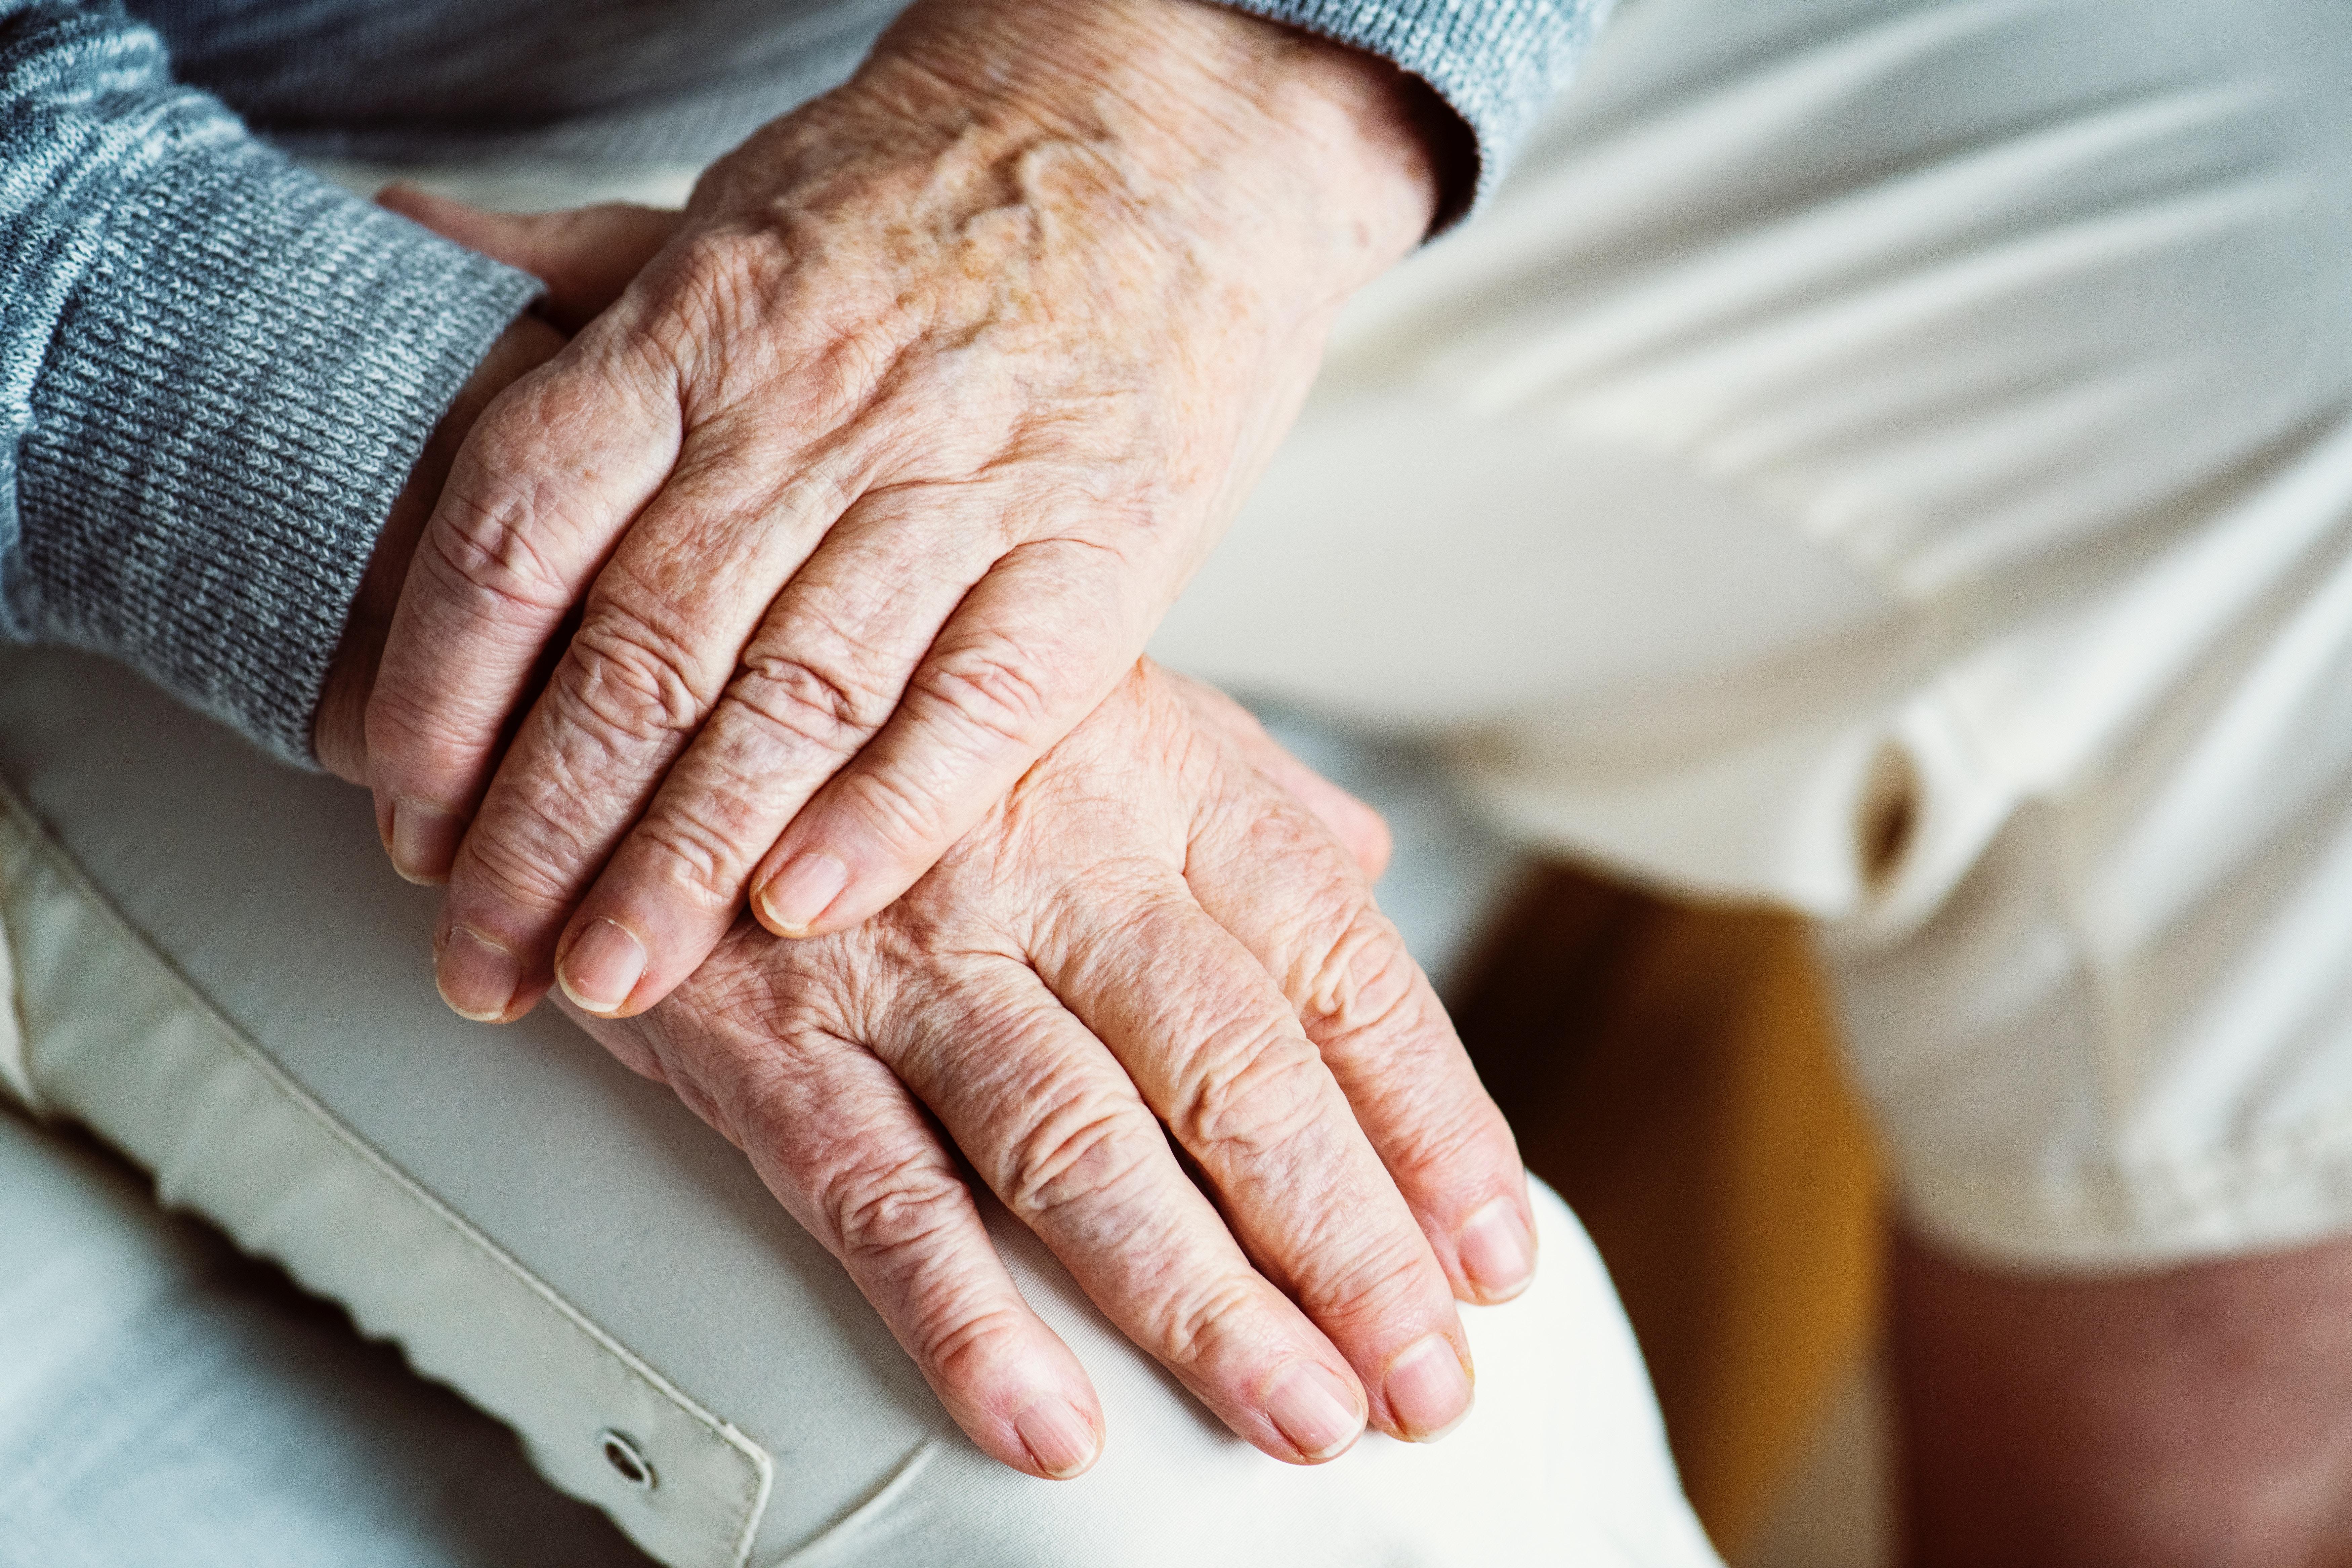 Retirement Home in Mount Pleasant, Retiring in Mount Pleasant, Retirement in Mount Pleasant, Senior Care in Mount Pleasant, Retirement Services in Brant